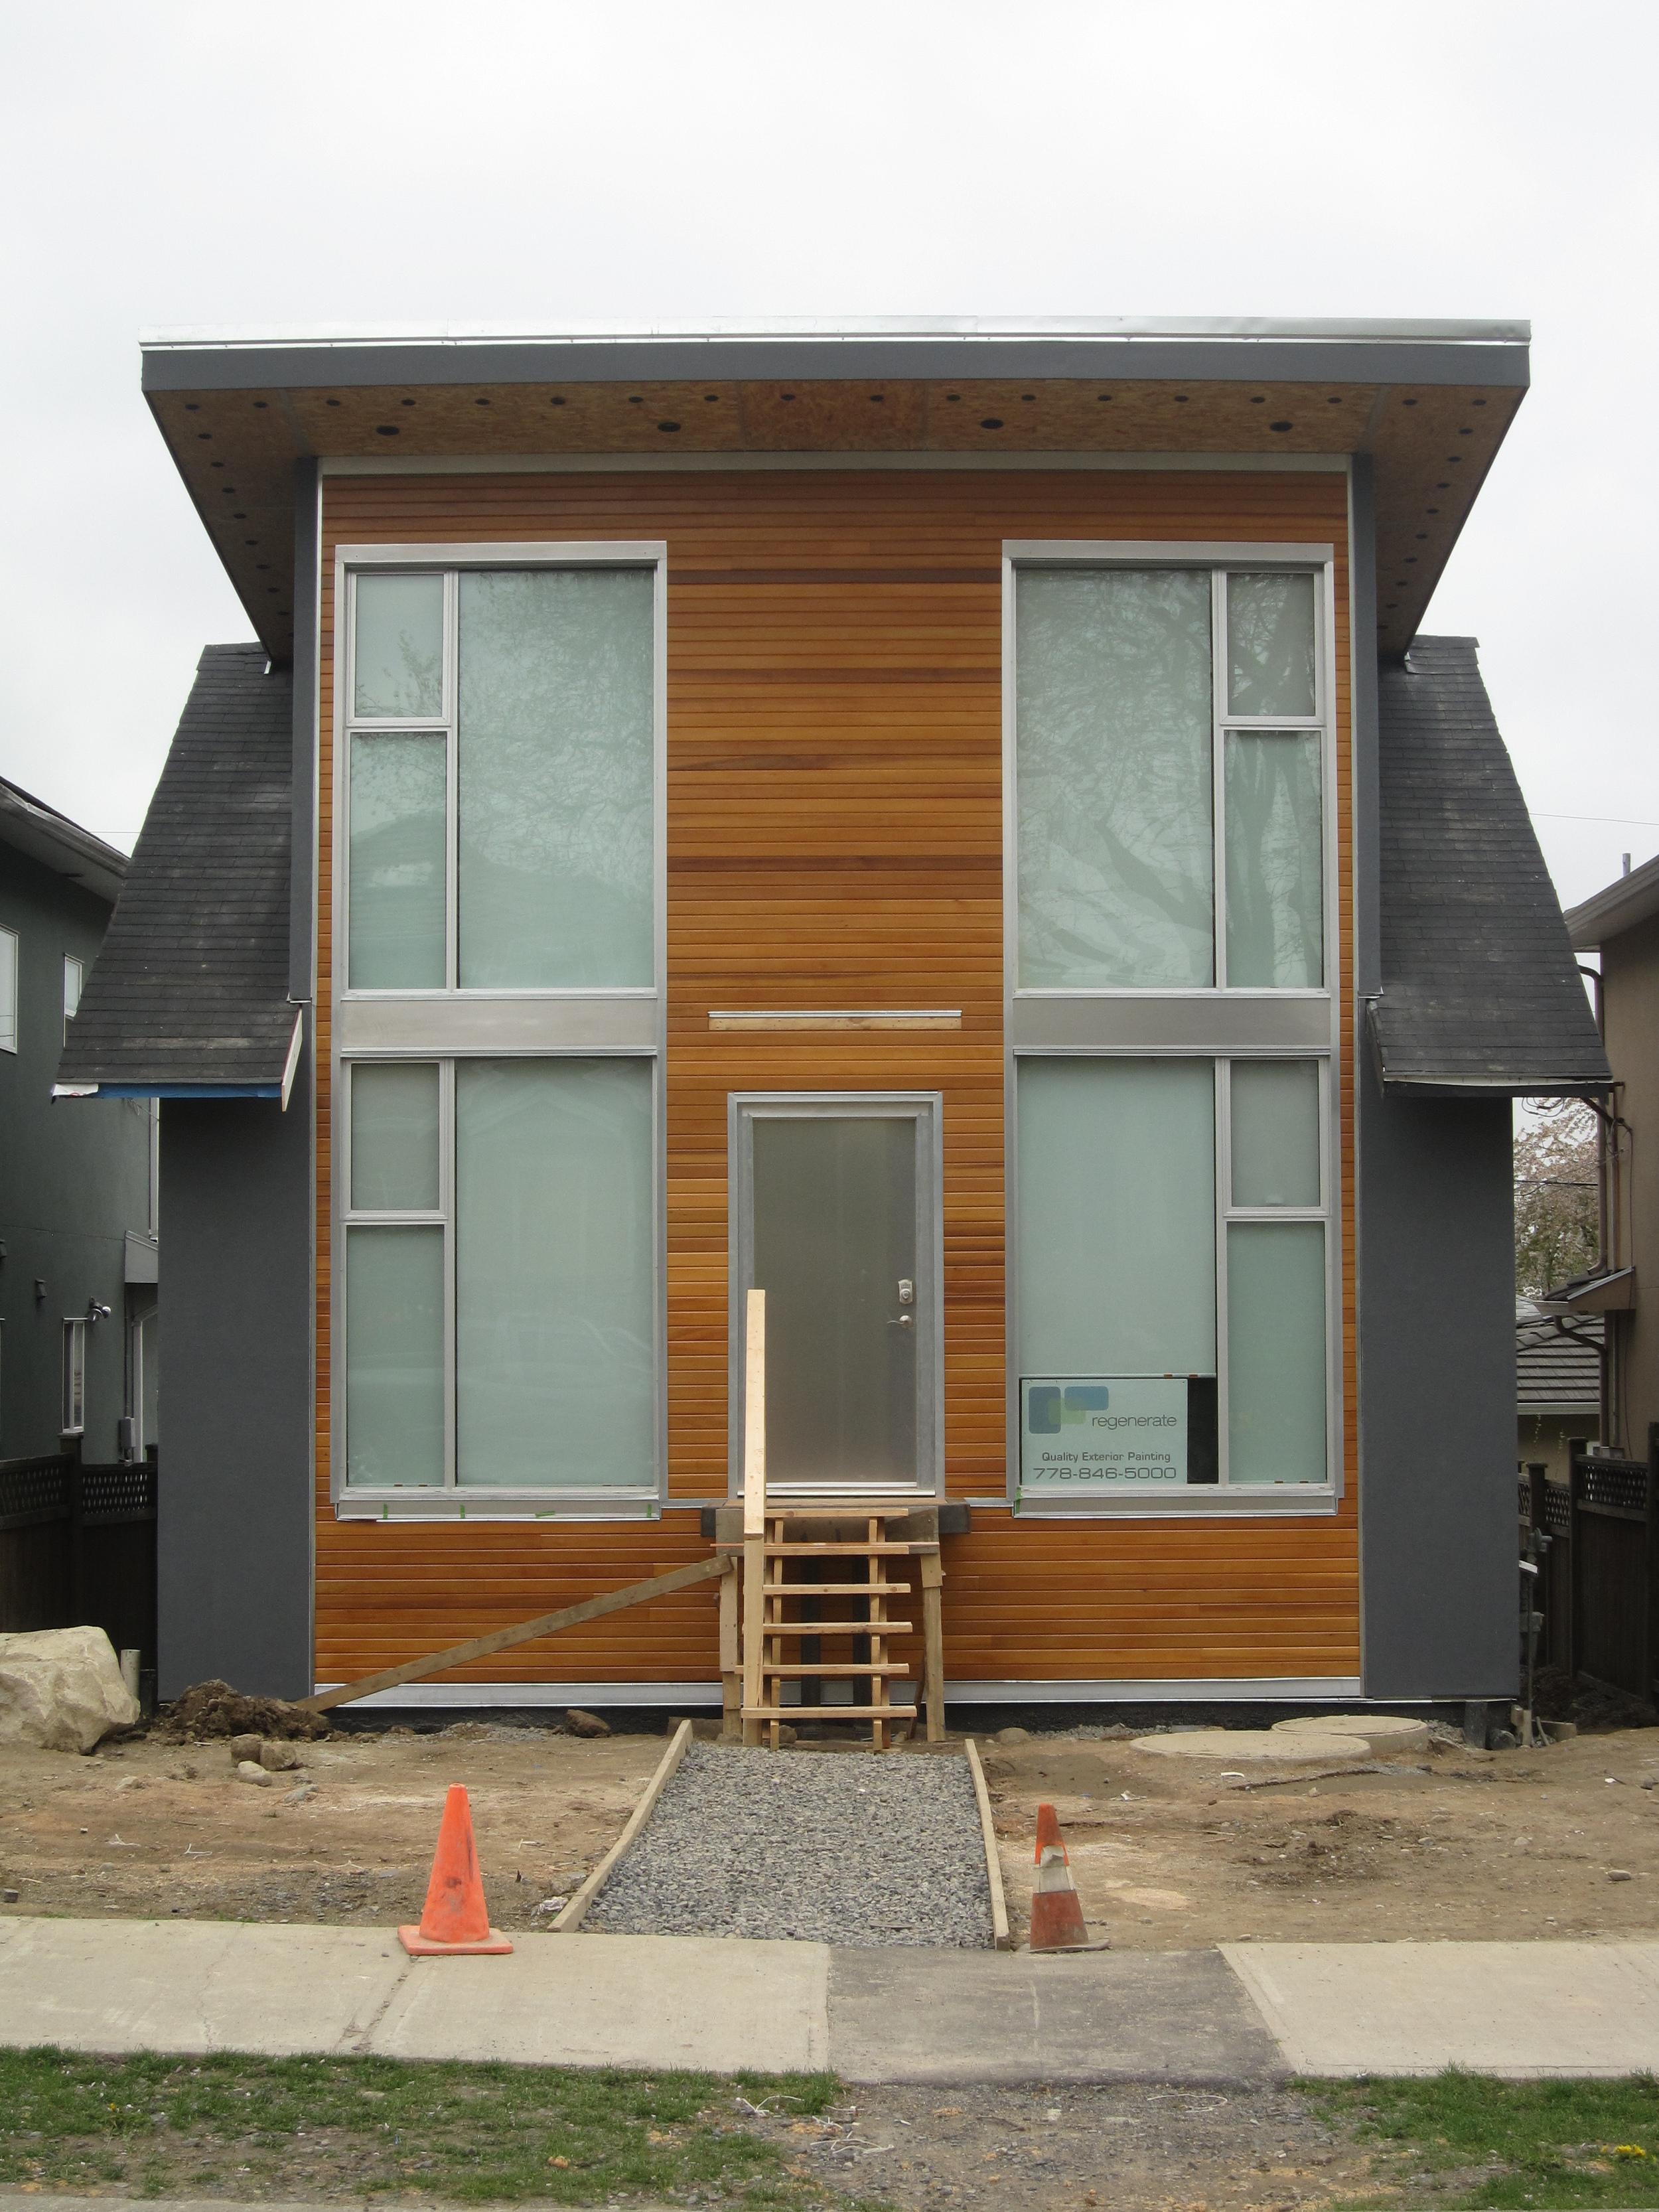 Regenerate Construction: Window Installation + Exterior Cladding